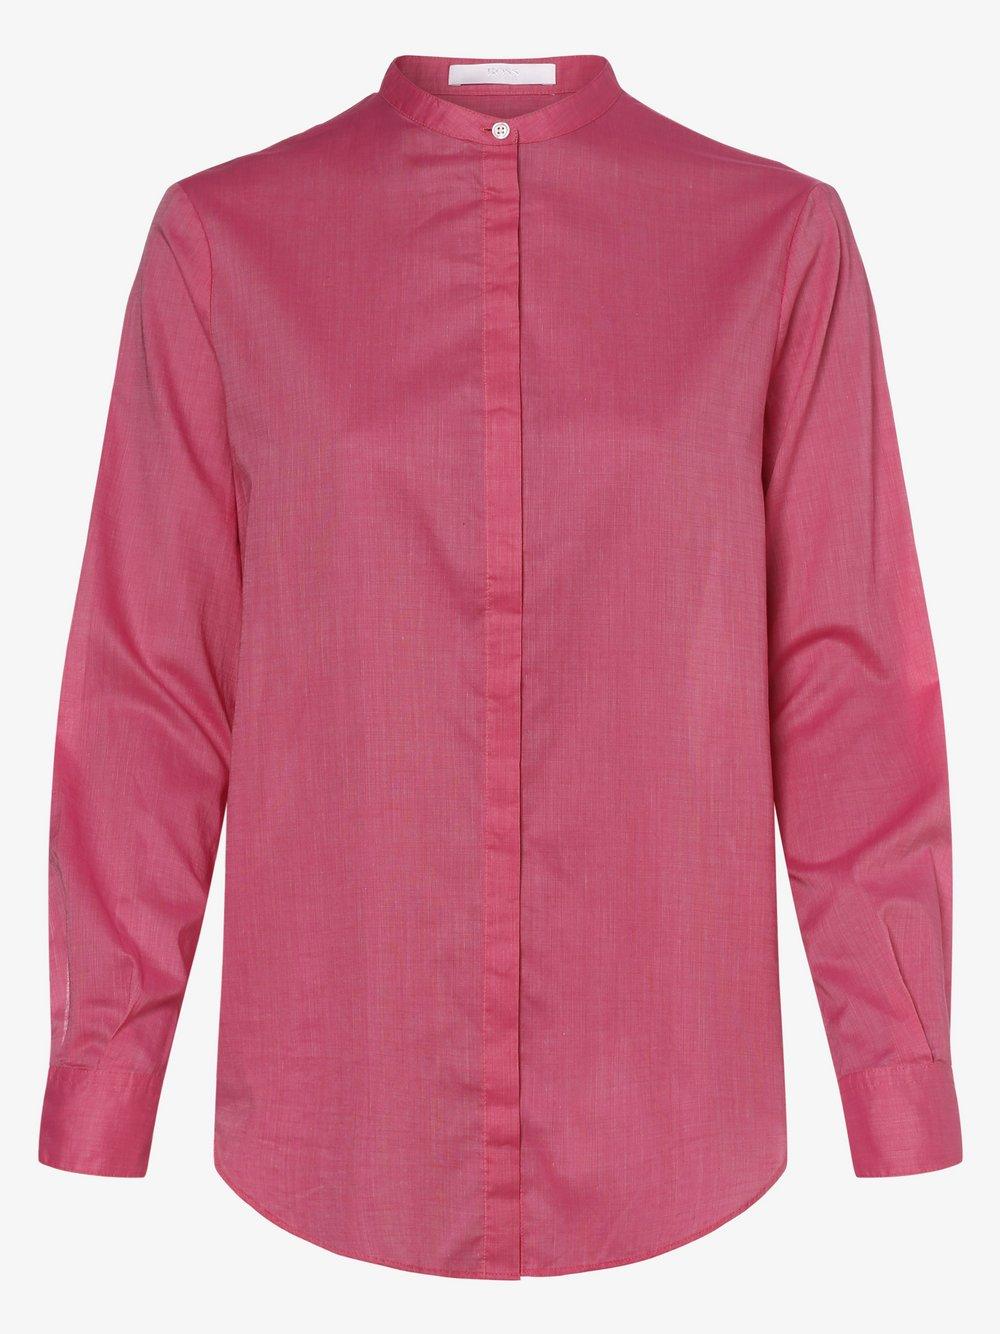 BOSS Casual – Bluzka damska – Efelize_17, różowy Van Graaf 473058-0001-00420